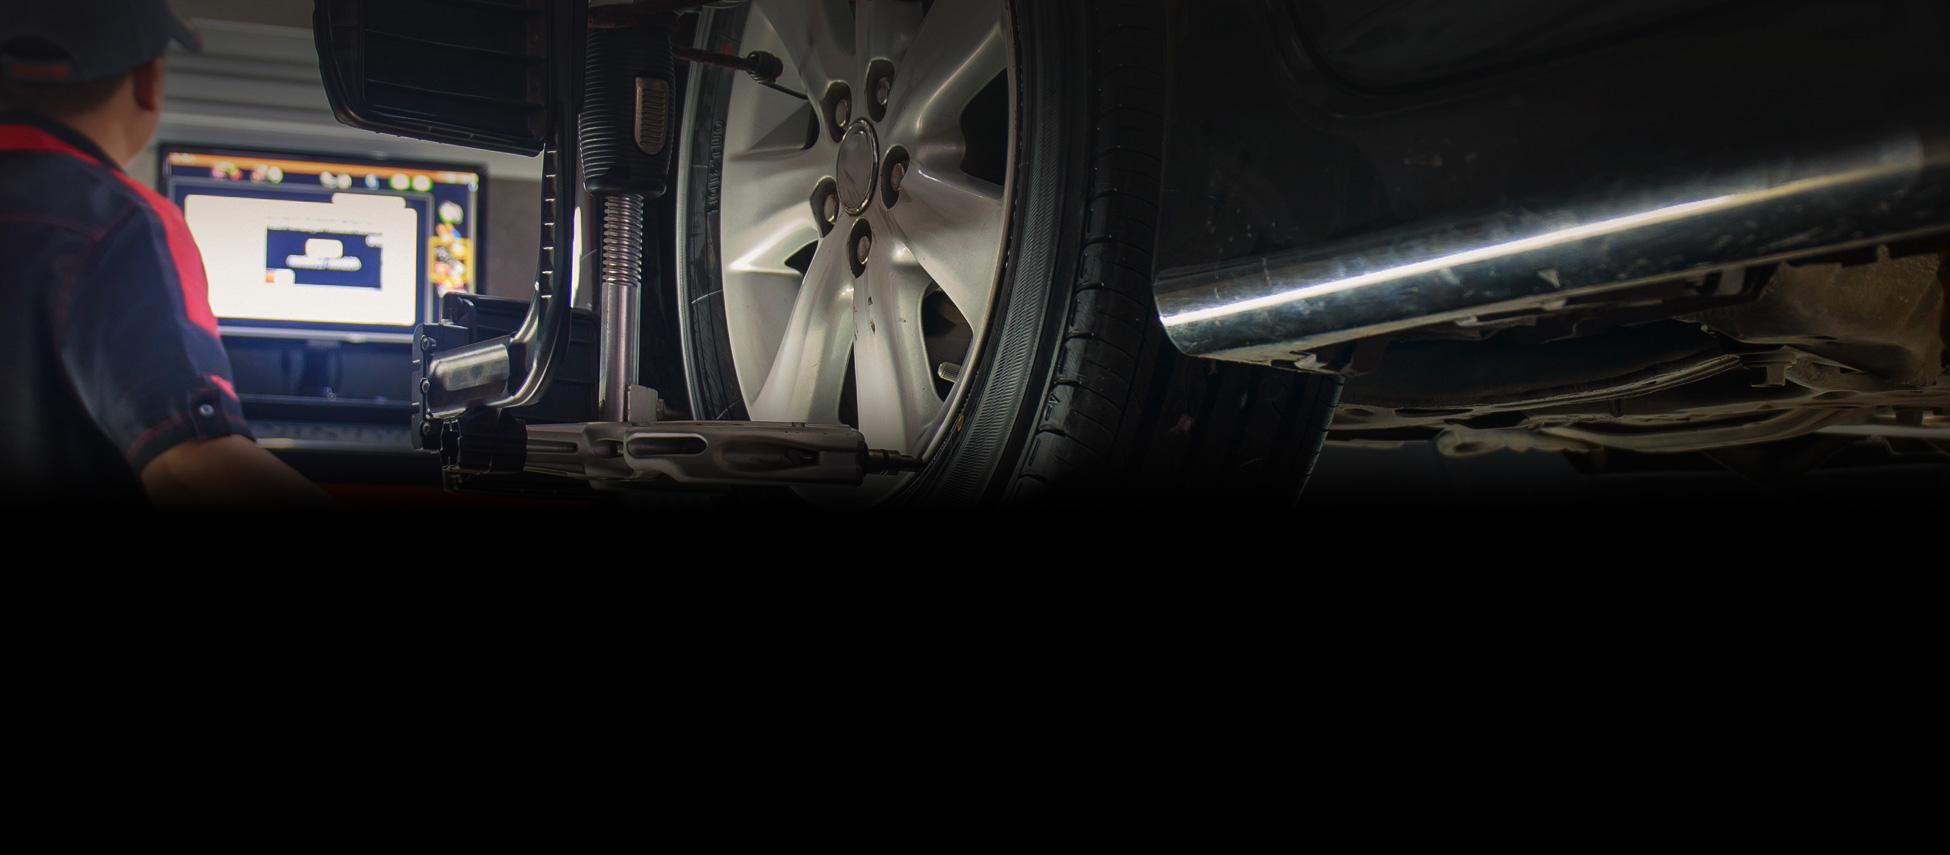 tires & auto repair in egg harbor township, nj | deltona discount tire